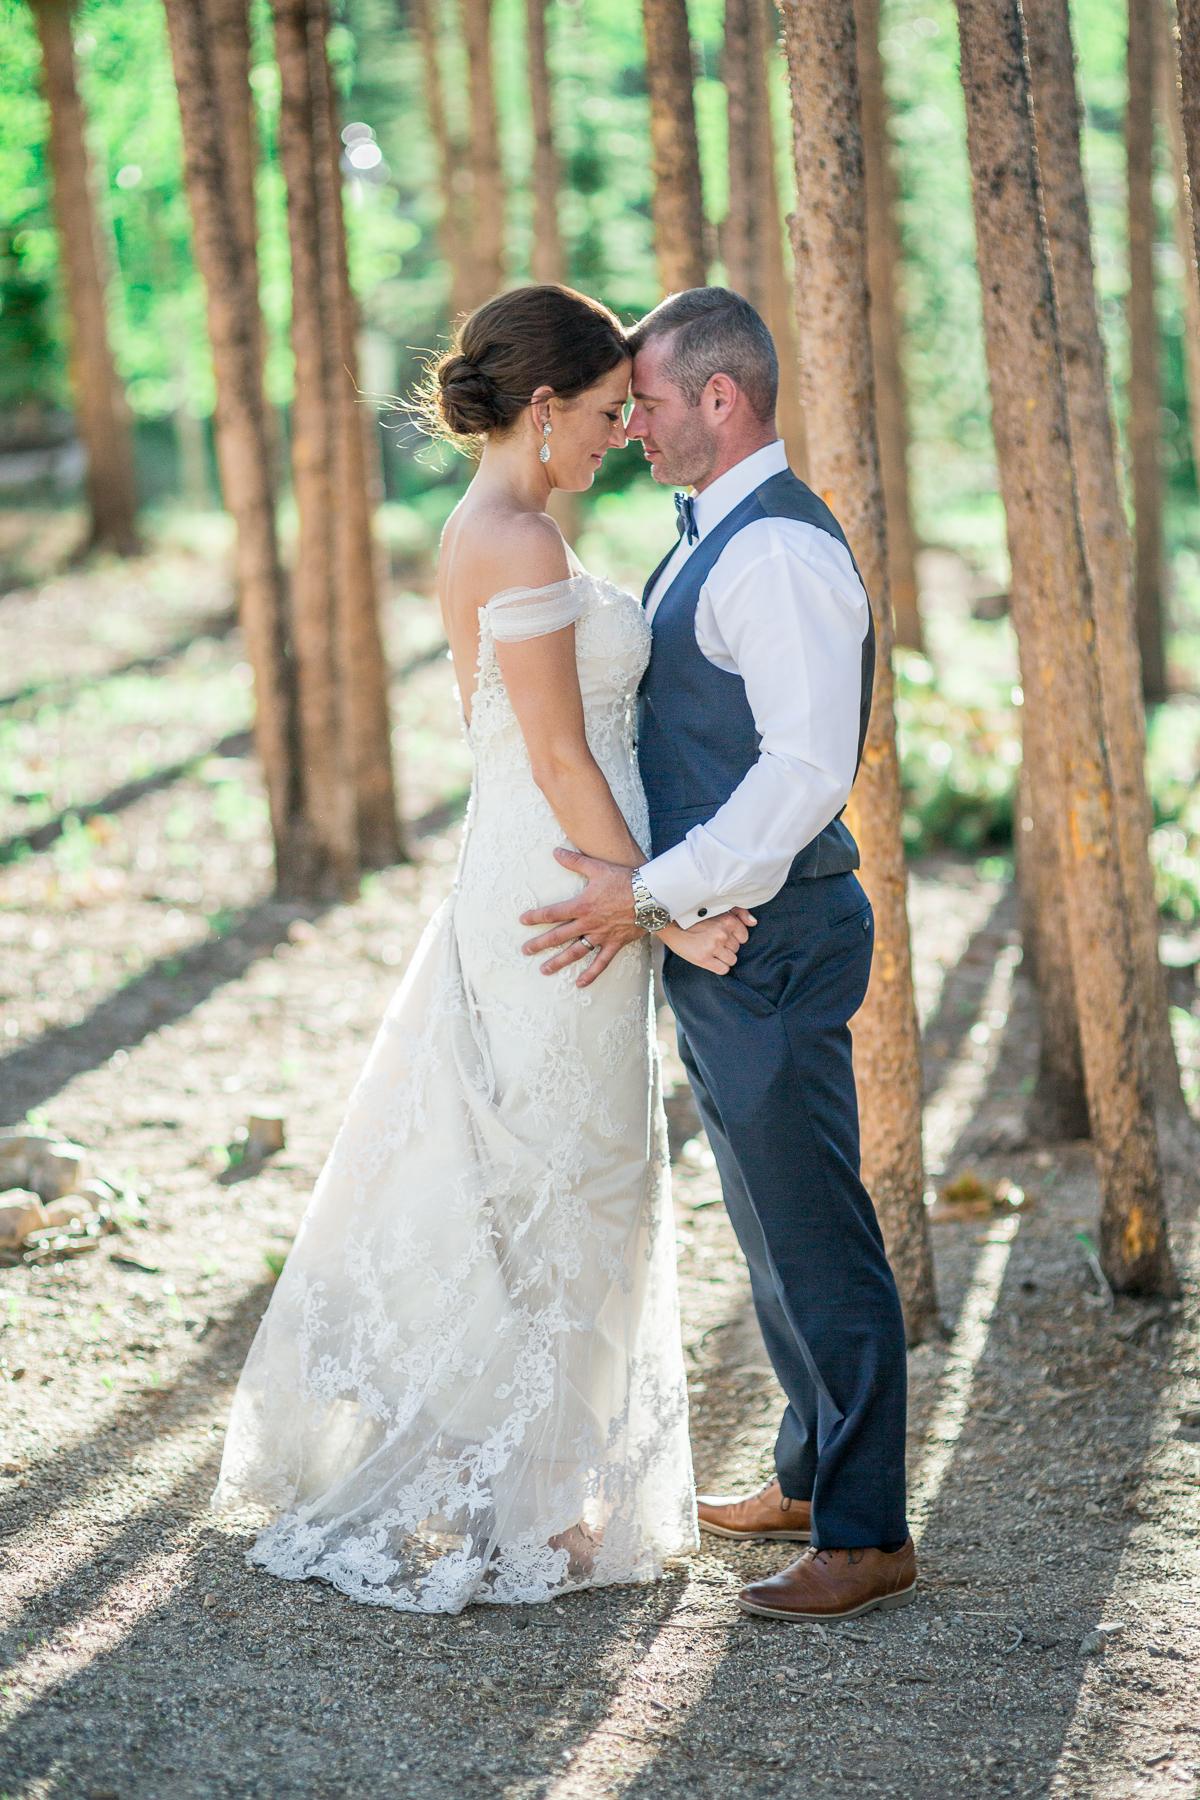 StaciDesign-Colorado-Wedding-5446.jpg